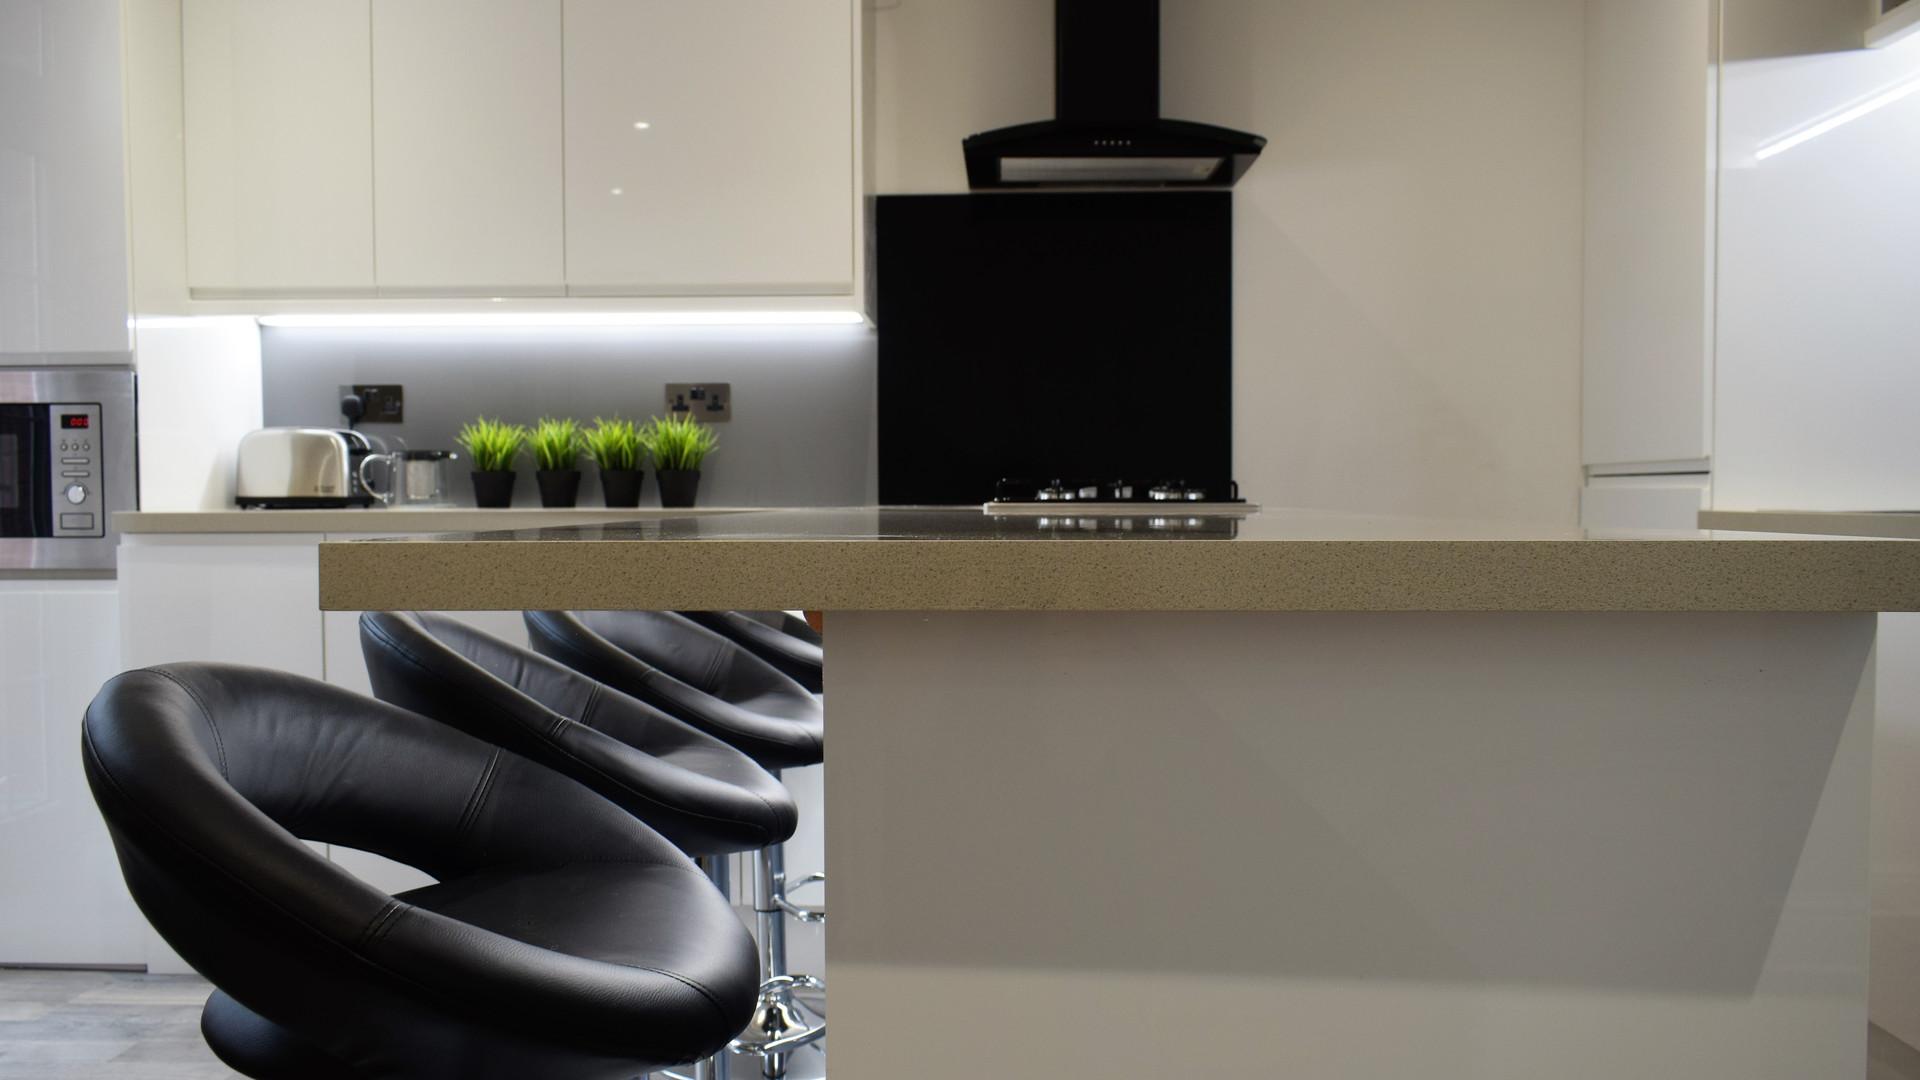 Island kitchen style, stunning shared home